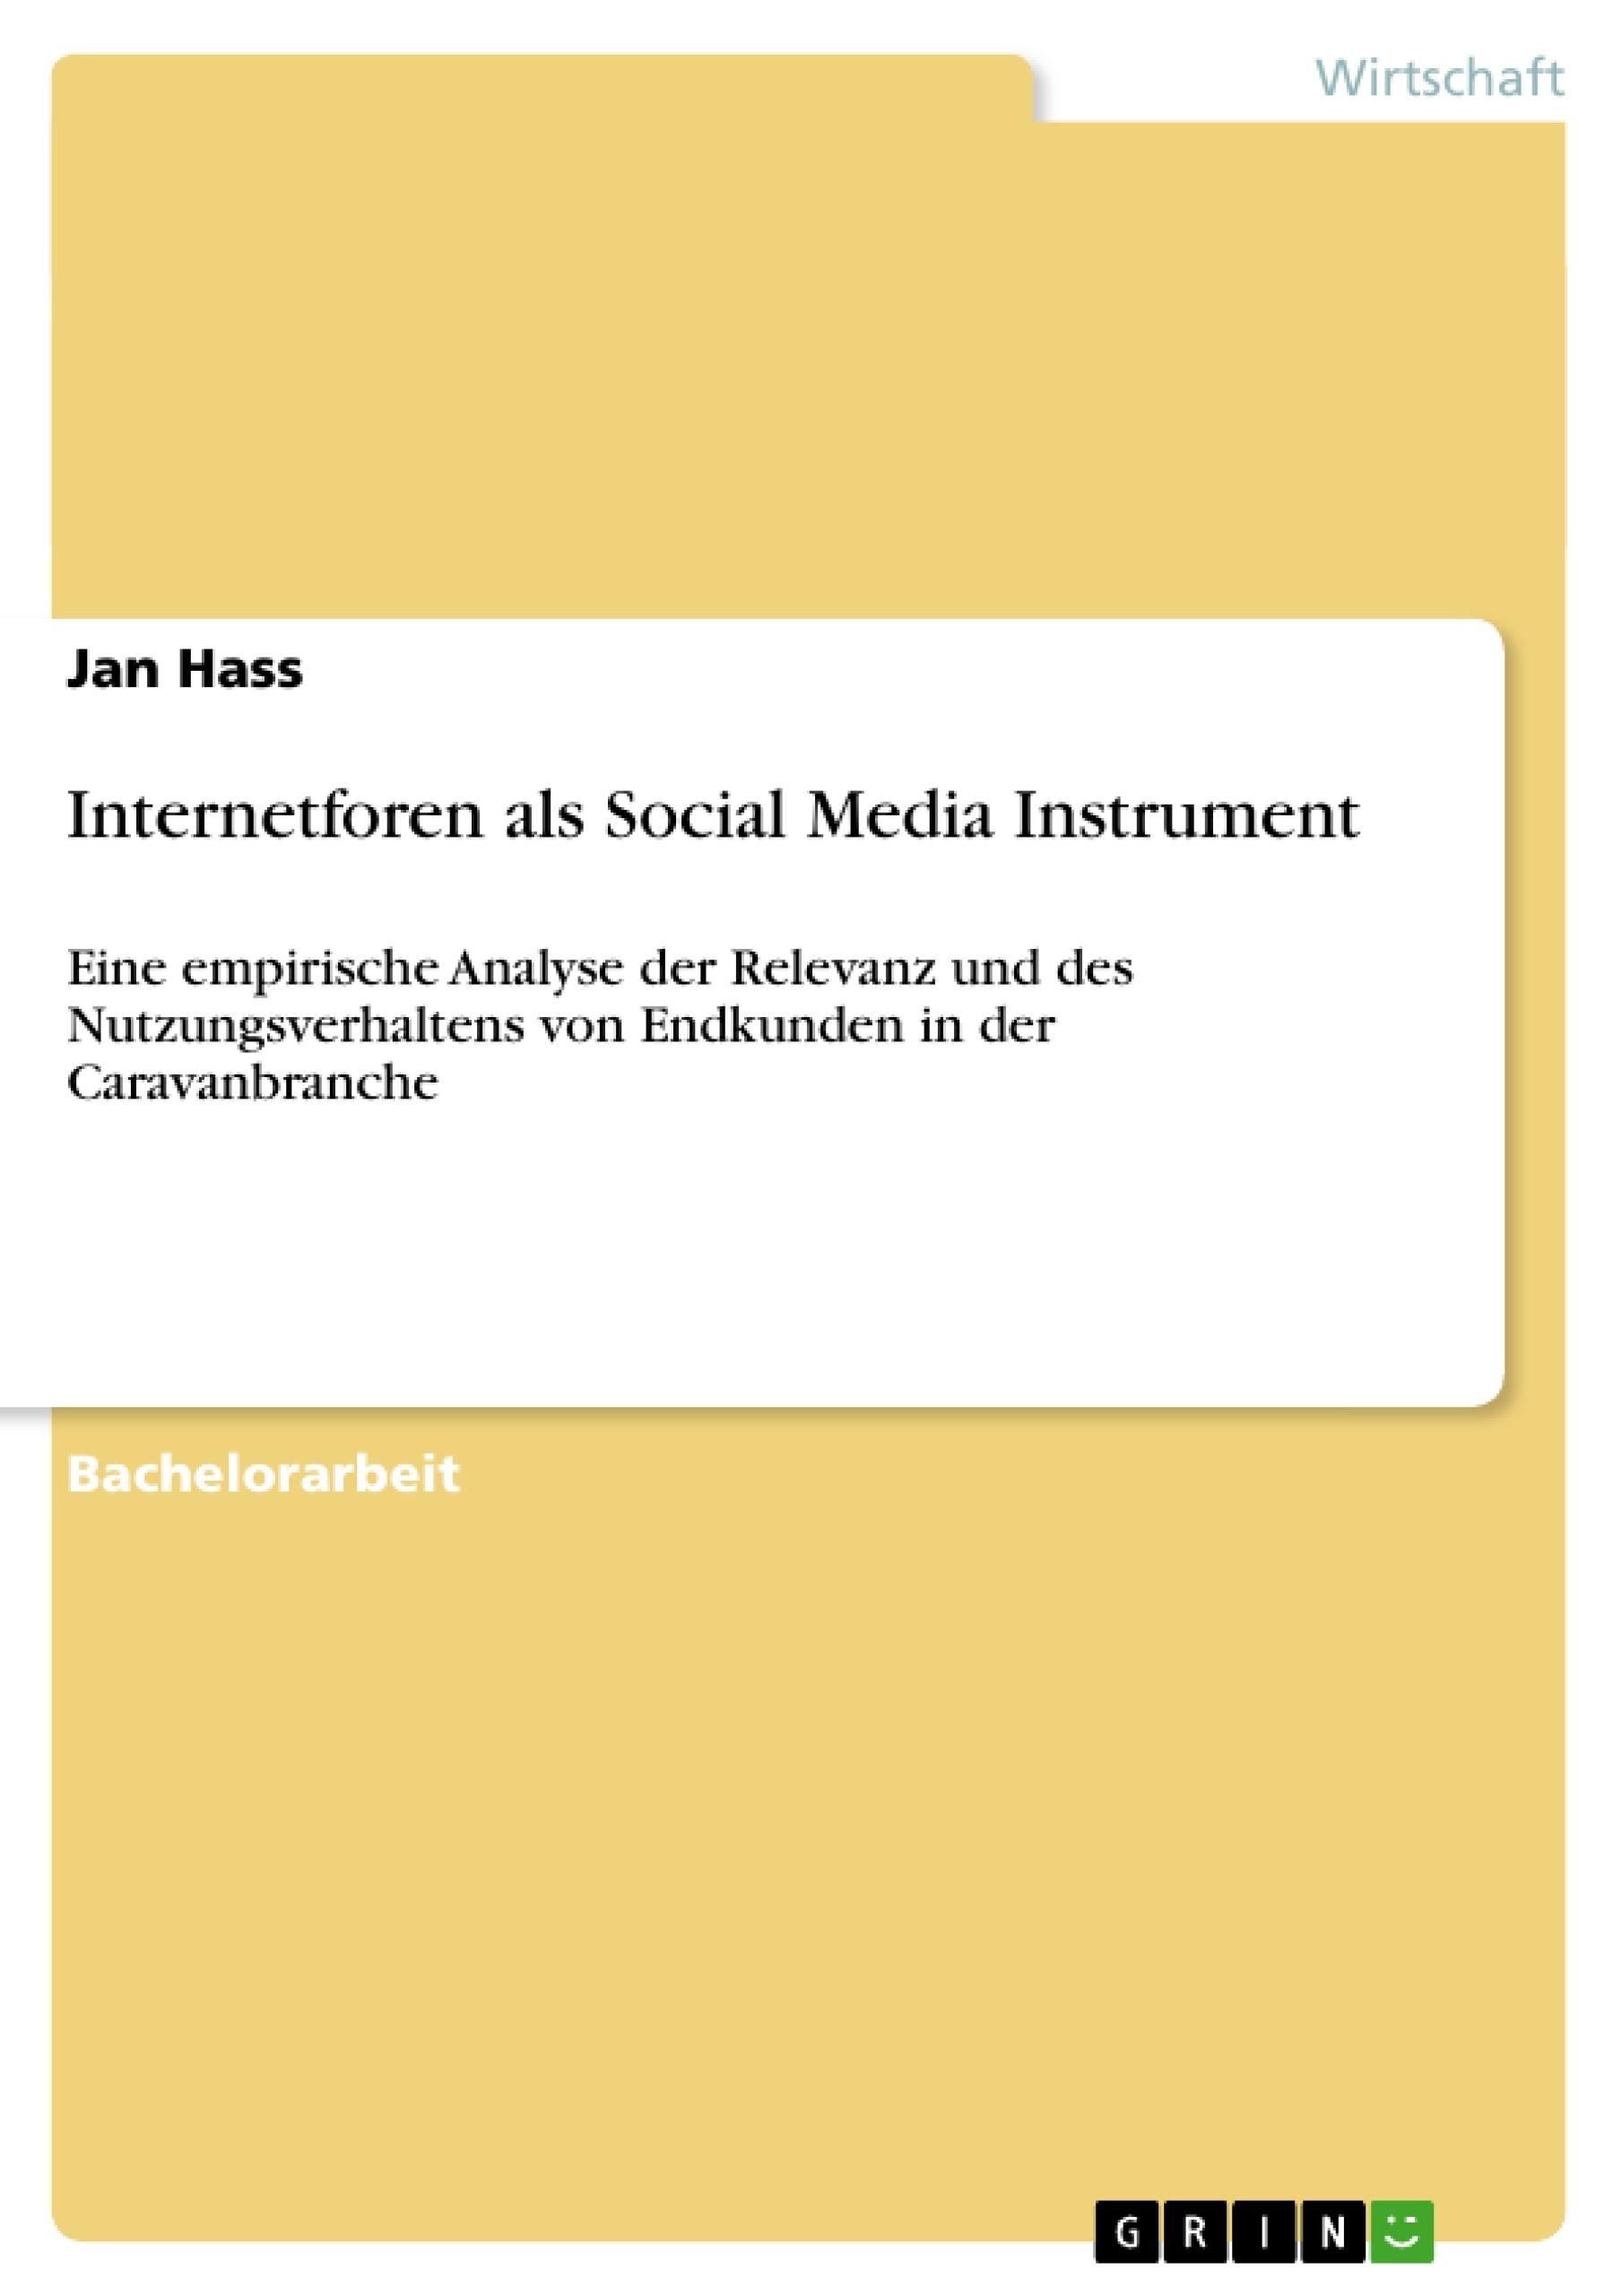 Titel: Internetforen als Social Media Instrument